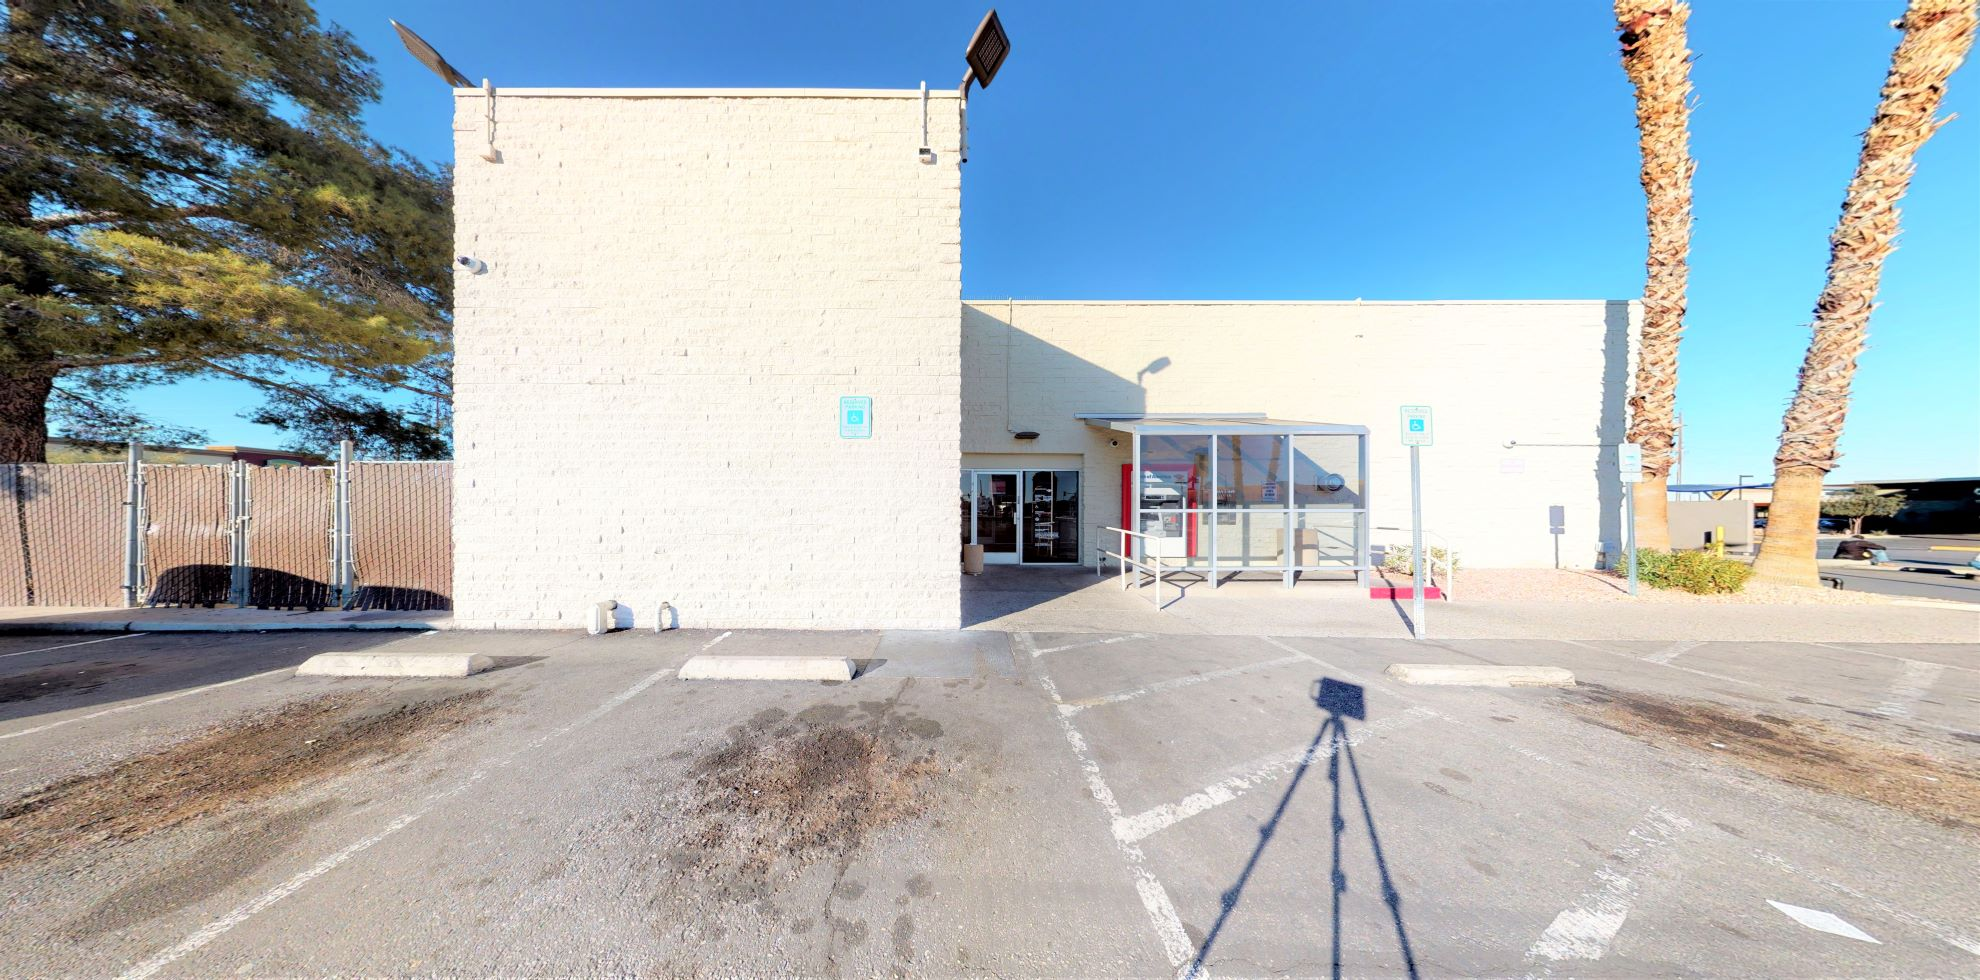 Bank of America financial center with drive-thru ATM   4801 W Charleston Blvd, Las Vegas, NV 89146